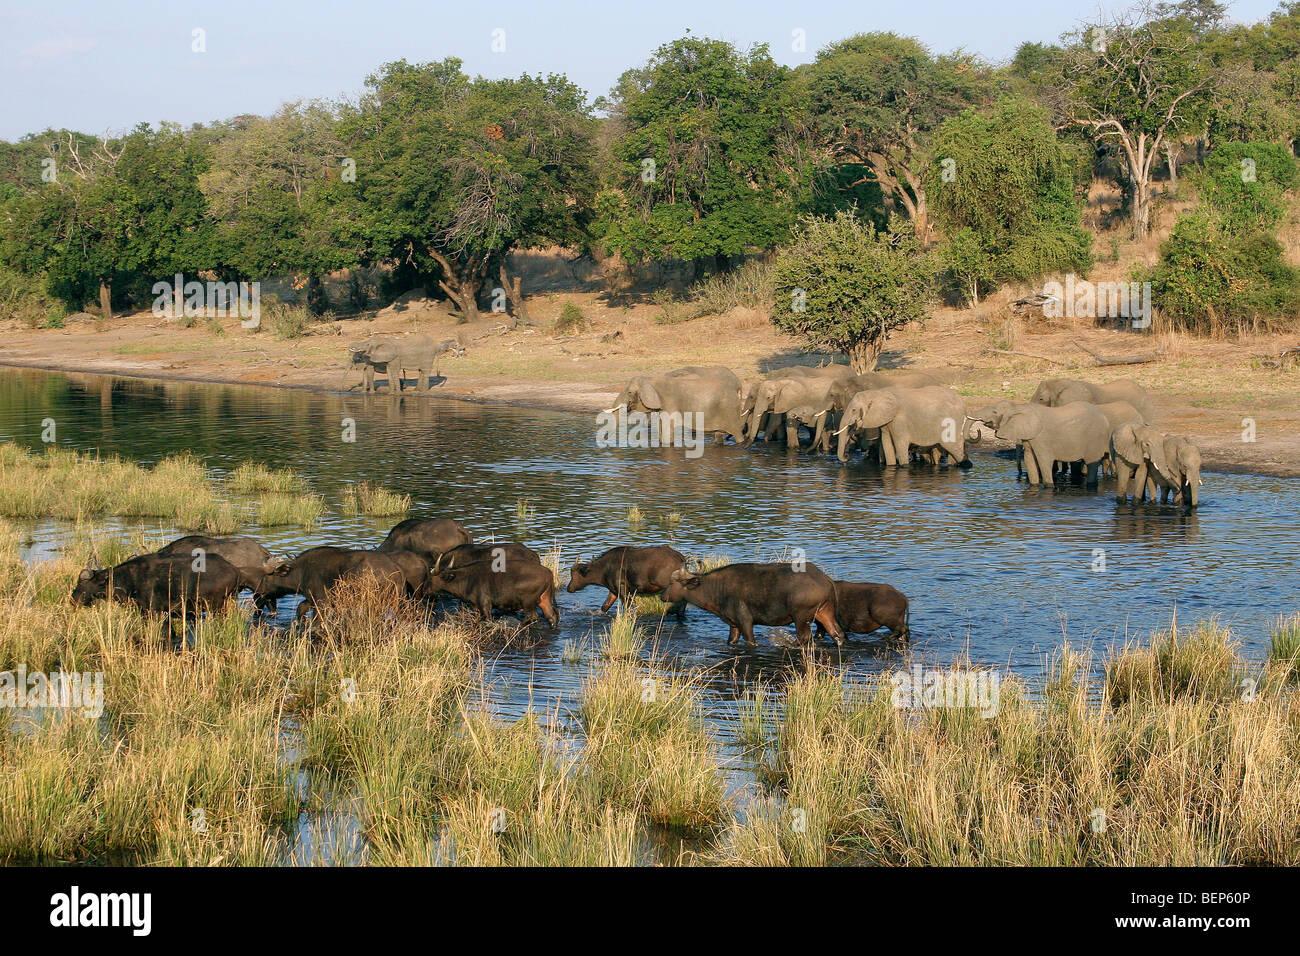 African elephants (Loxodonta africana) and buffalos (Syncerus caffer) drinking in river, Chobe National Park, Botswana, - Stock Image